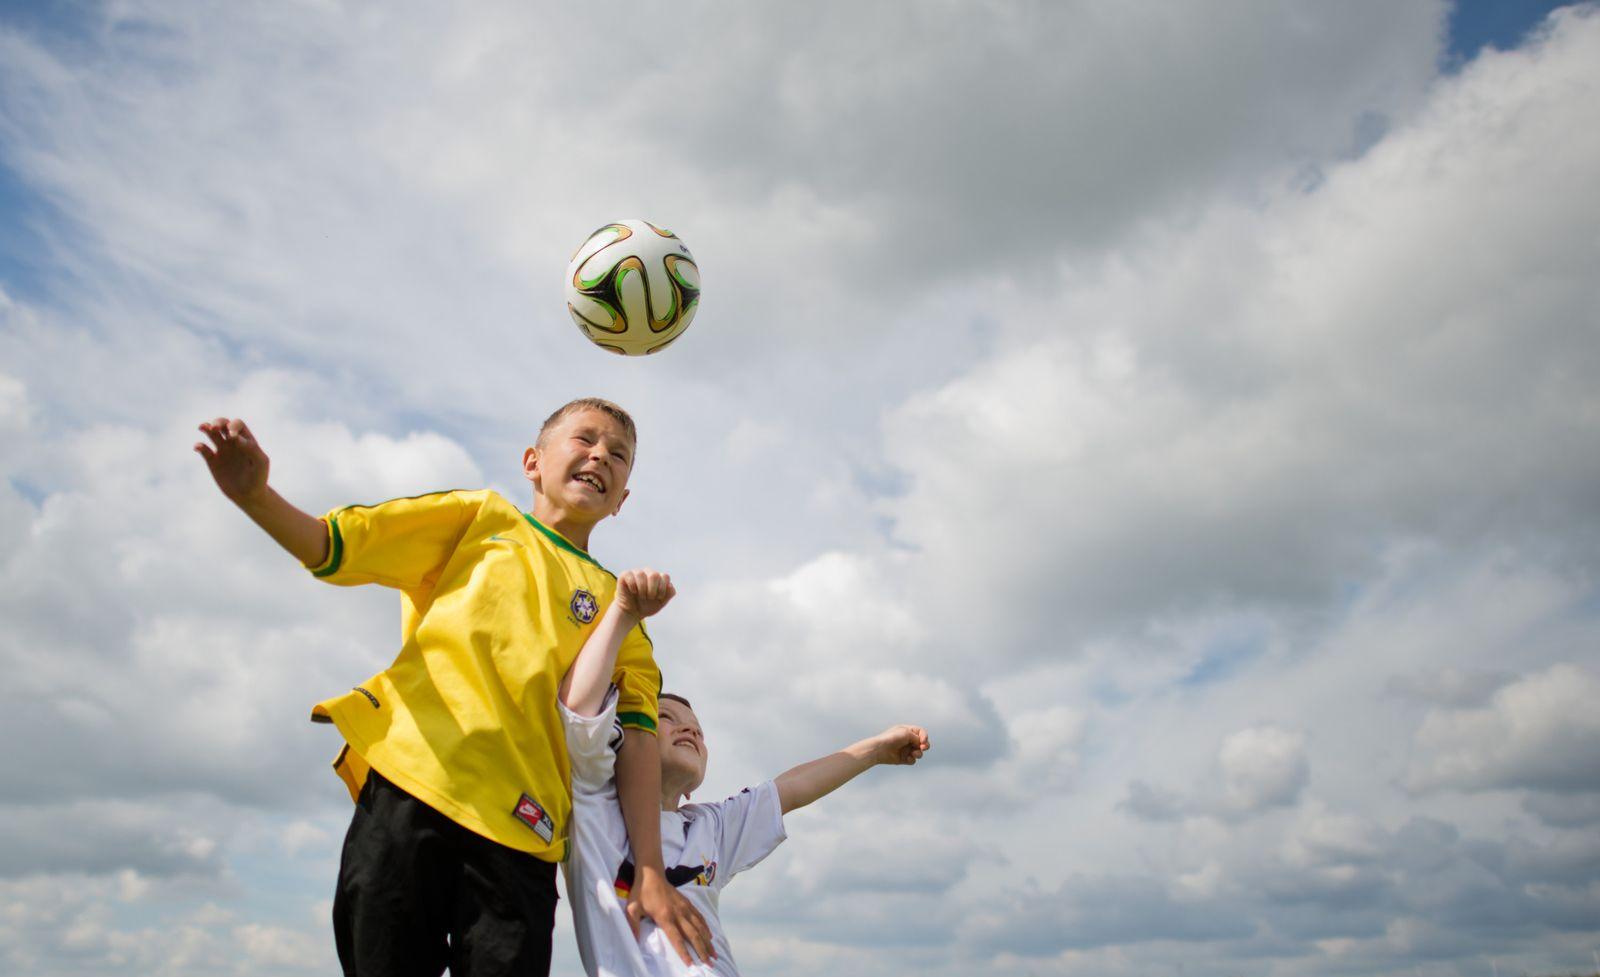 Kinder Fußball Kopfball